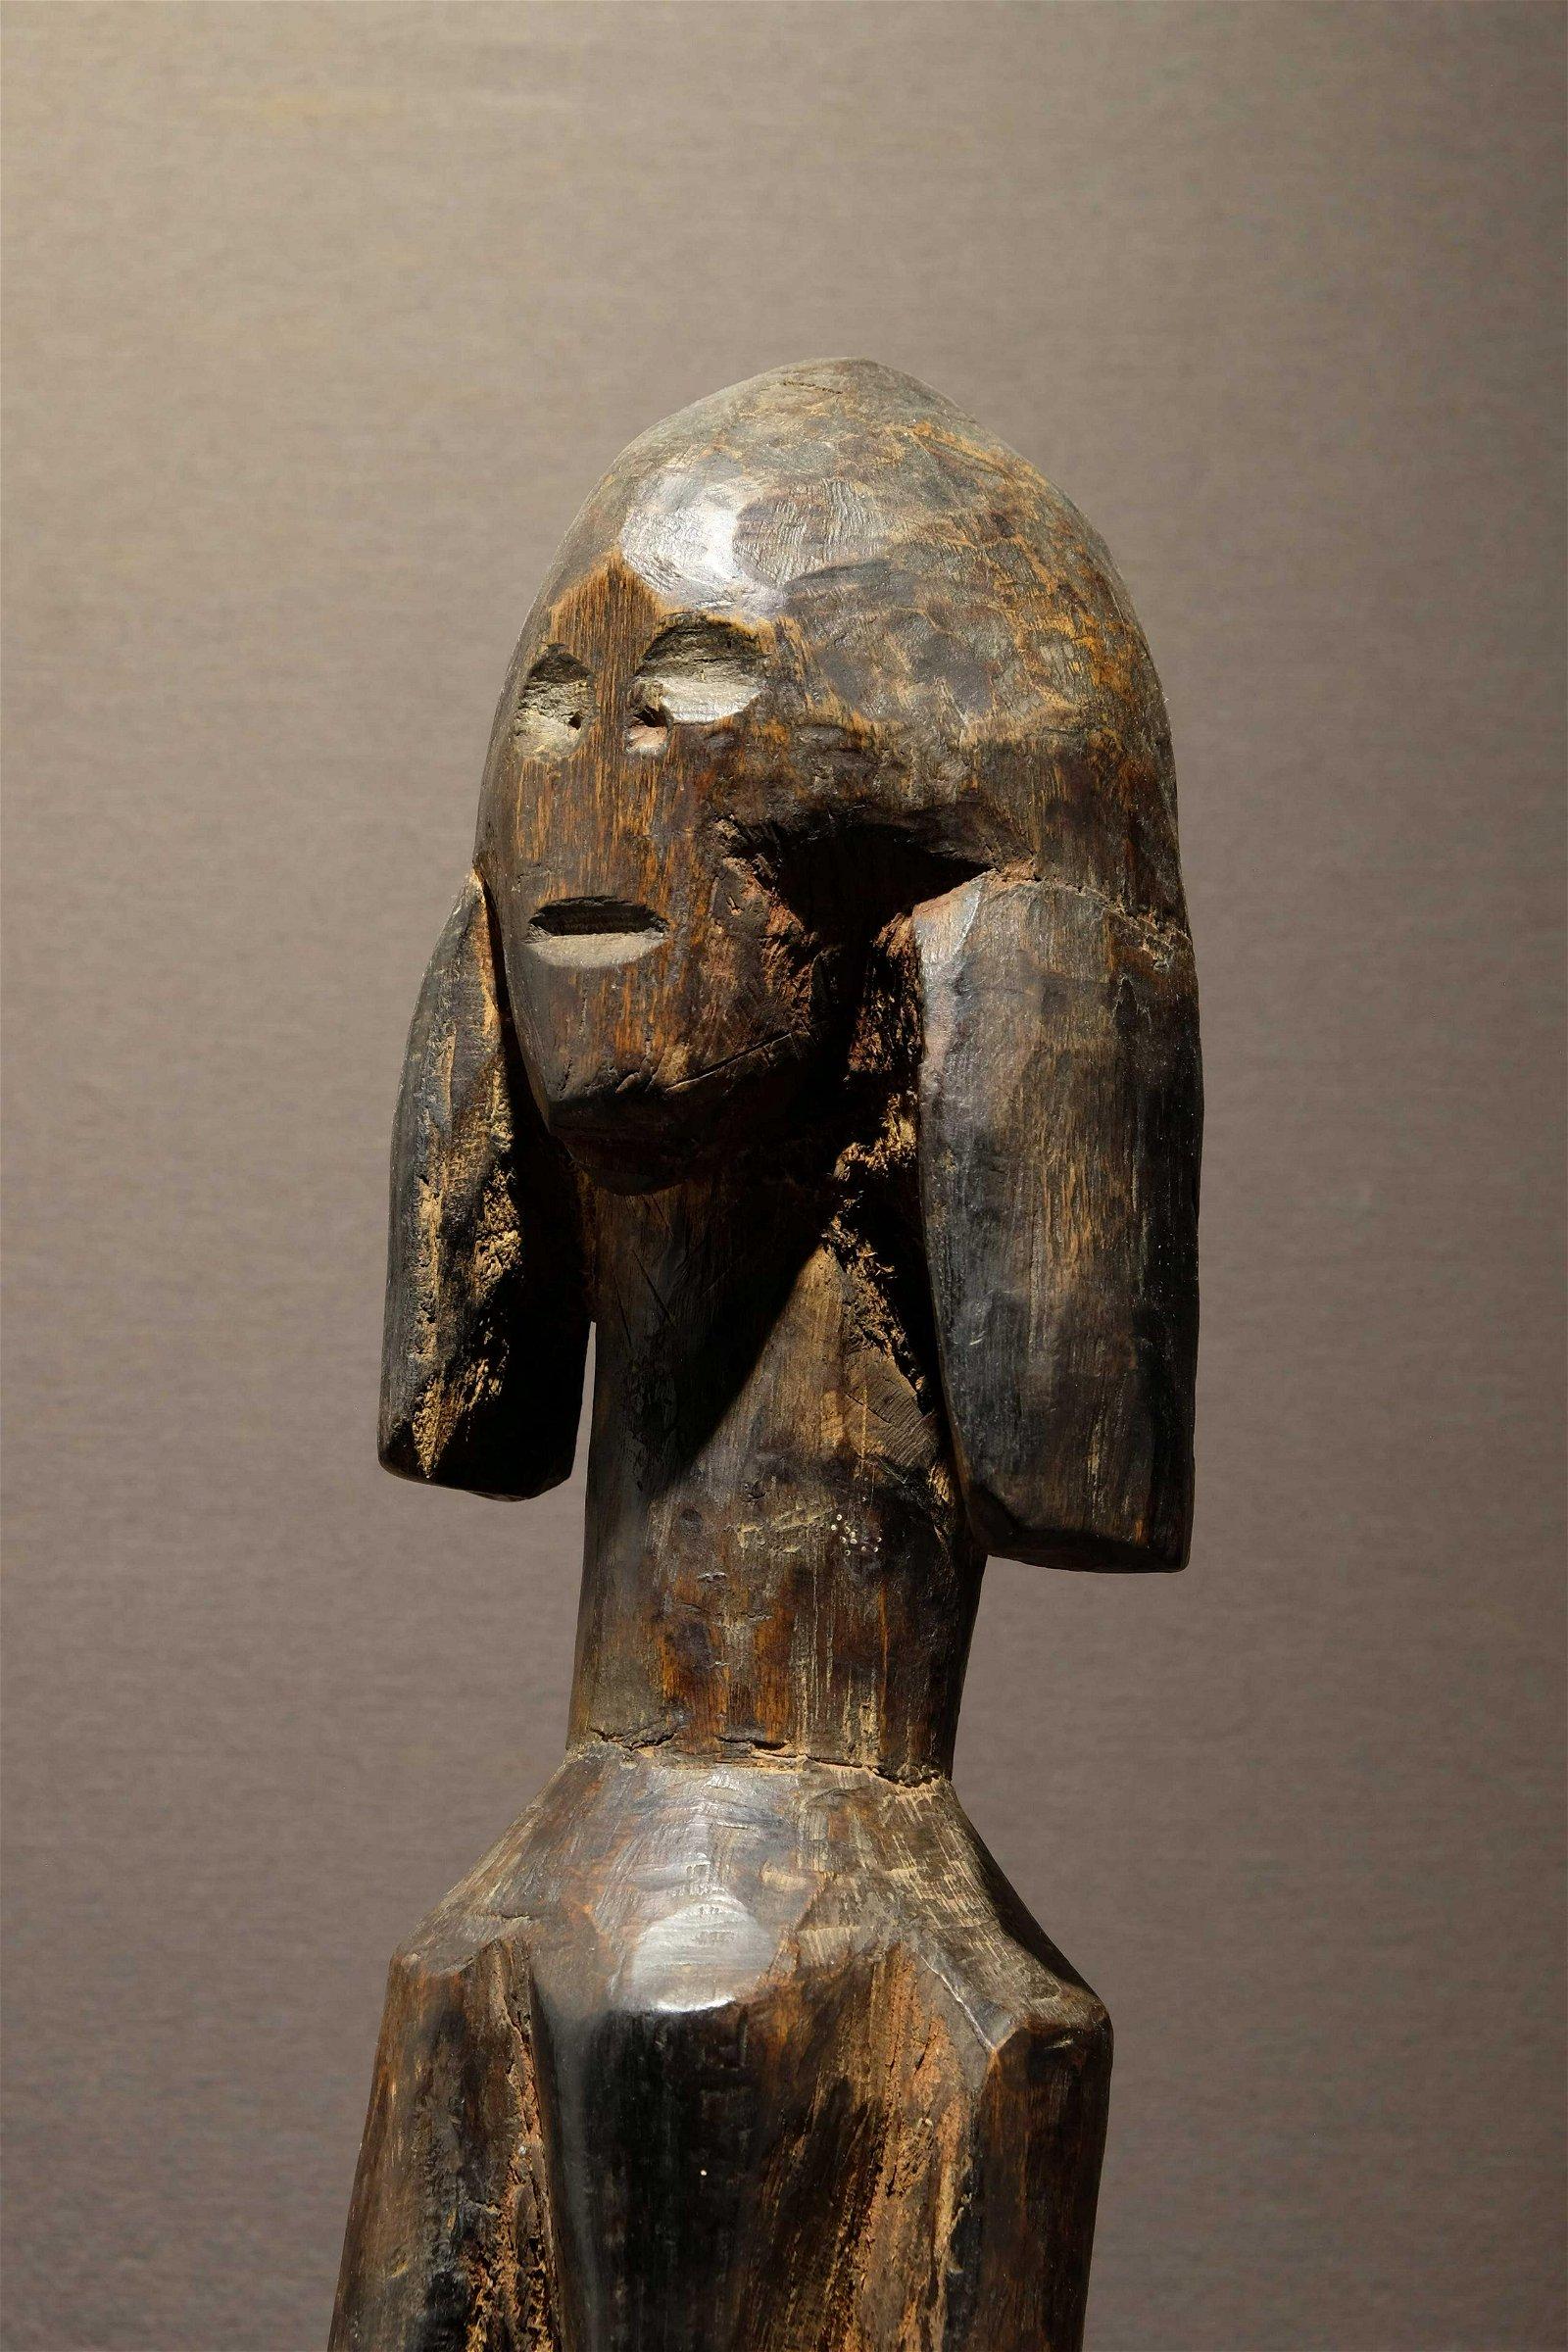 A Mumuye Figure Prov:Mark Verstockt collection